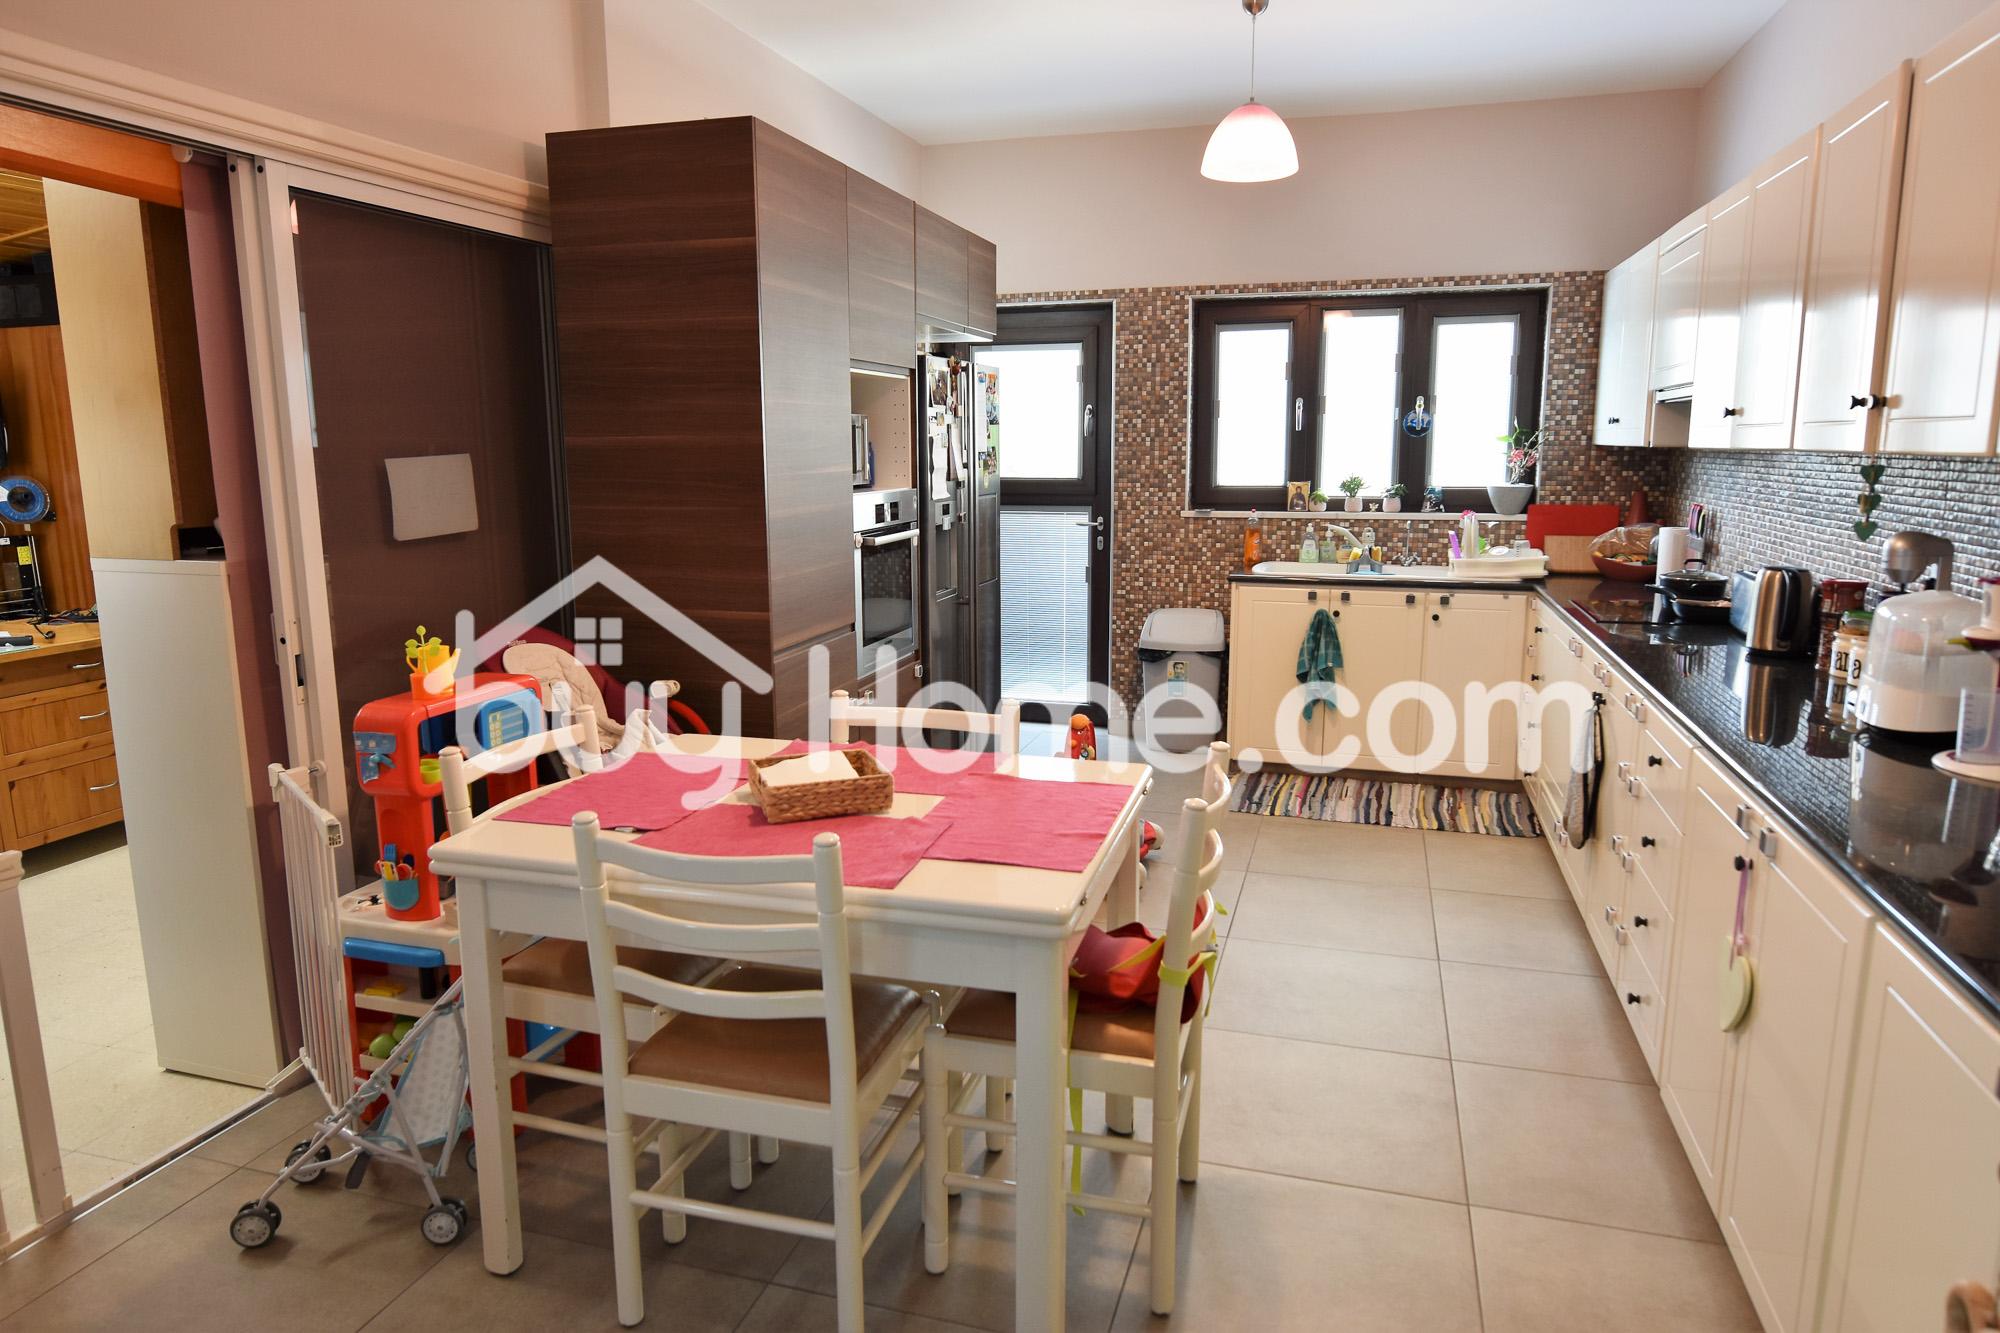 3 Bedroom Split Level House | BuyHome